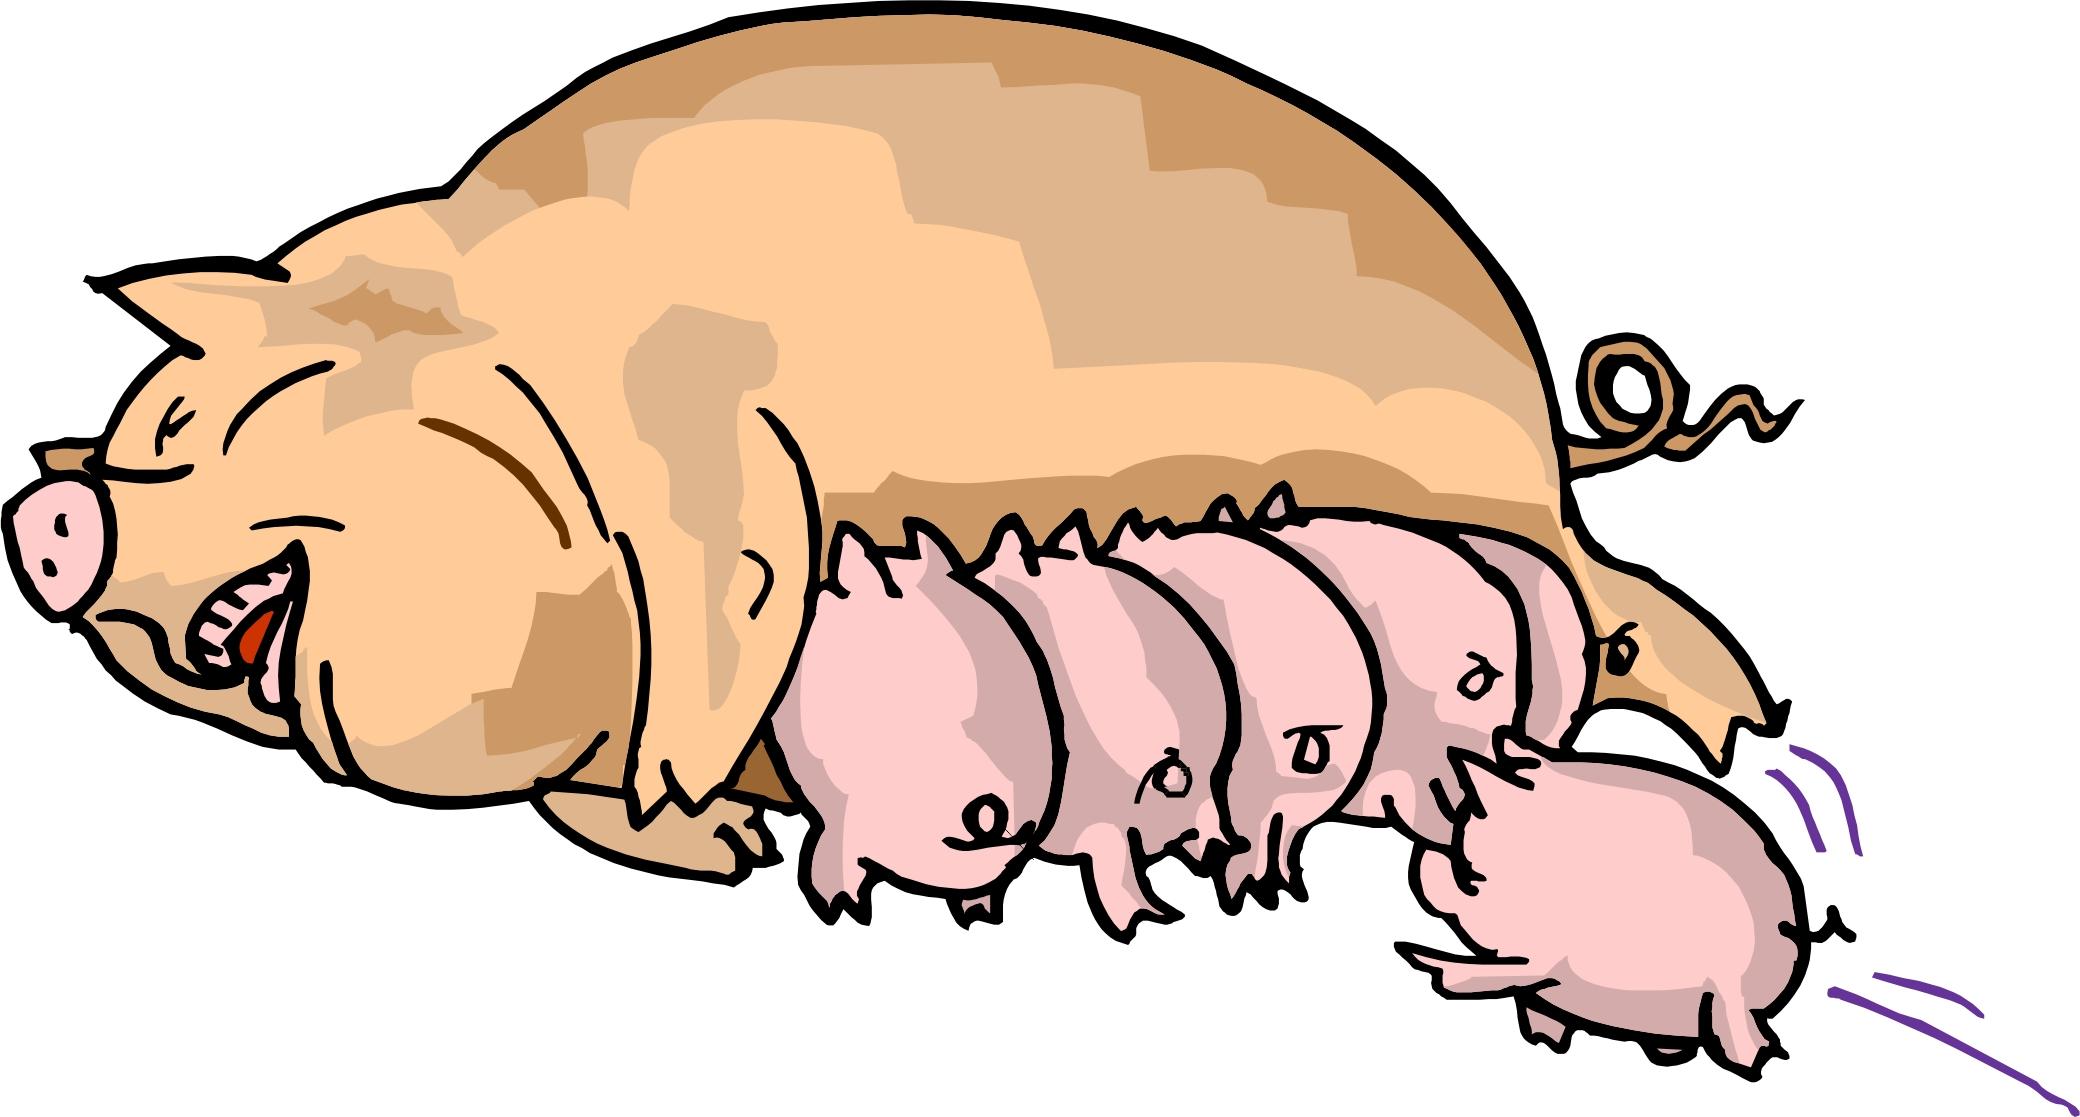 Free Piglets Cliparts, Download Free Clip Art, Free Clip Art.